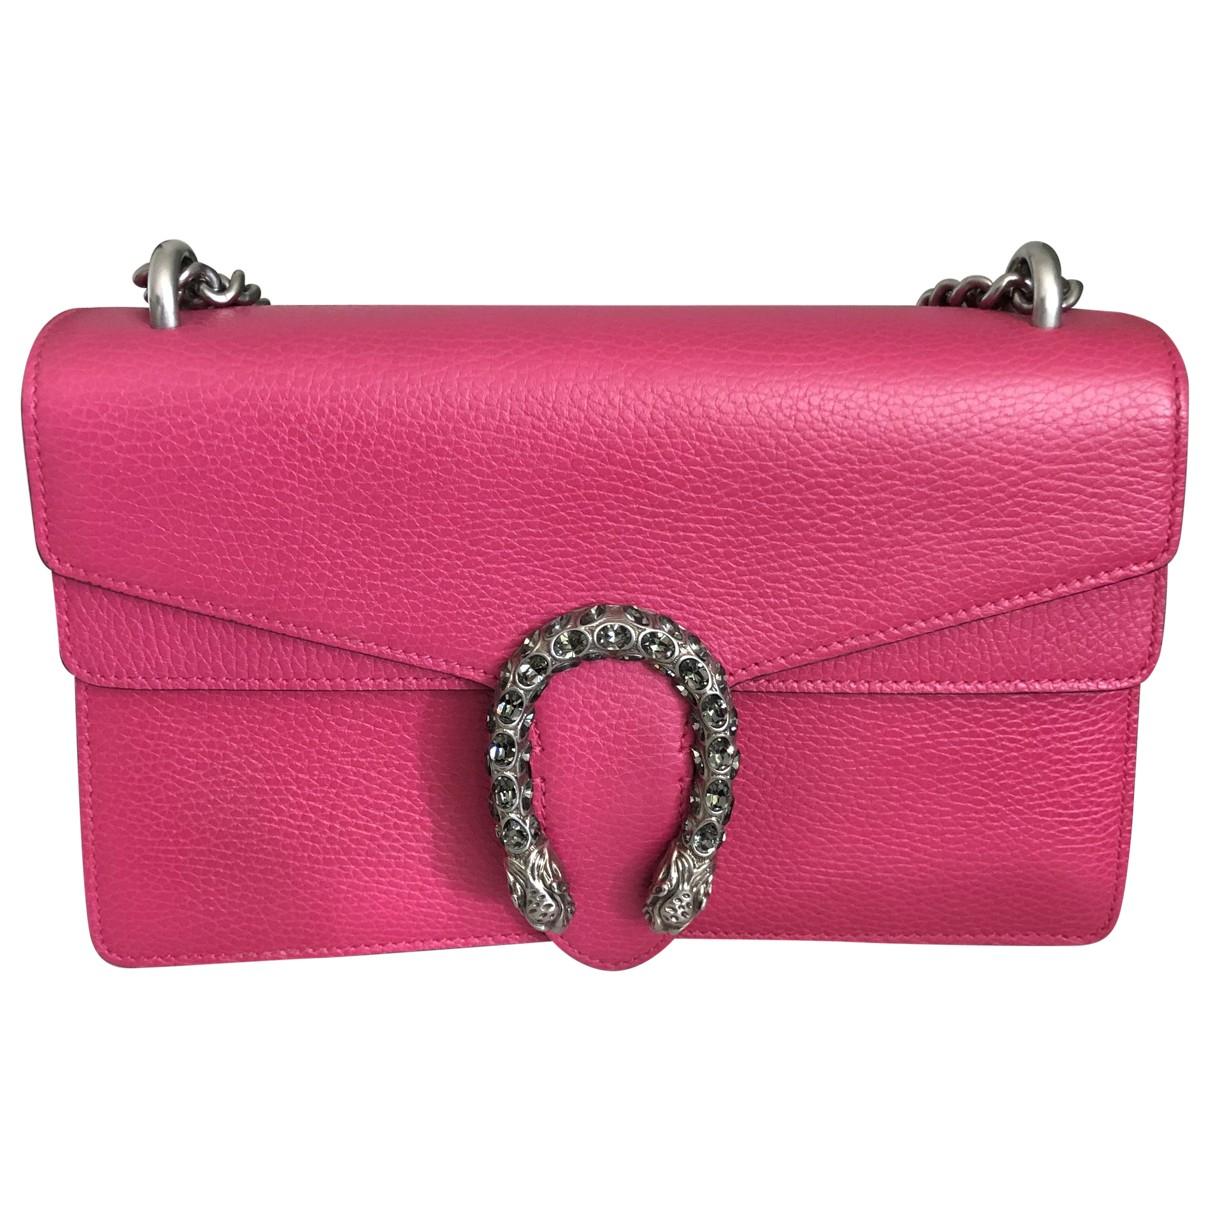 Gucci Dionysus Handtasche in  Rosa Leder